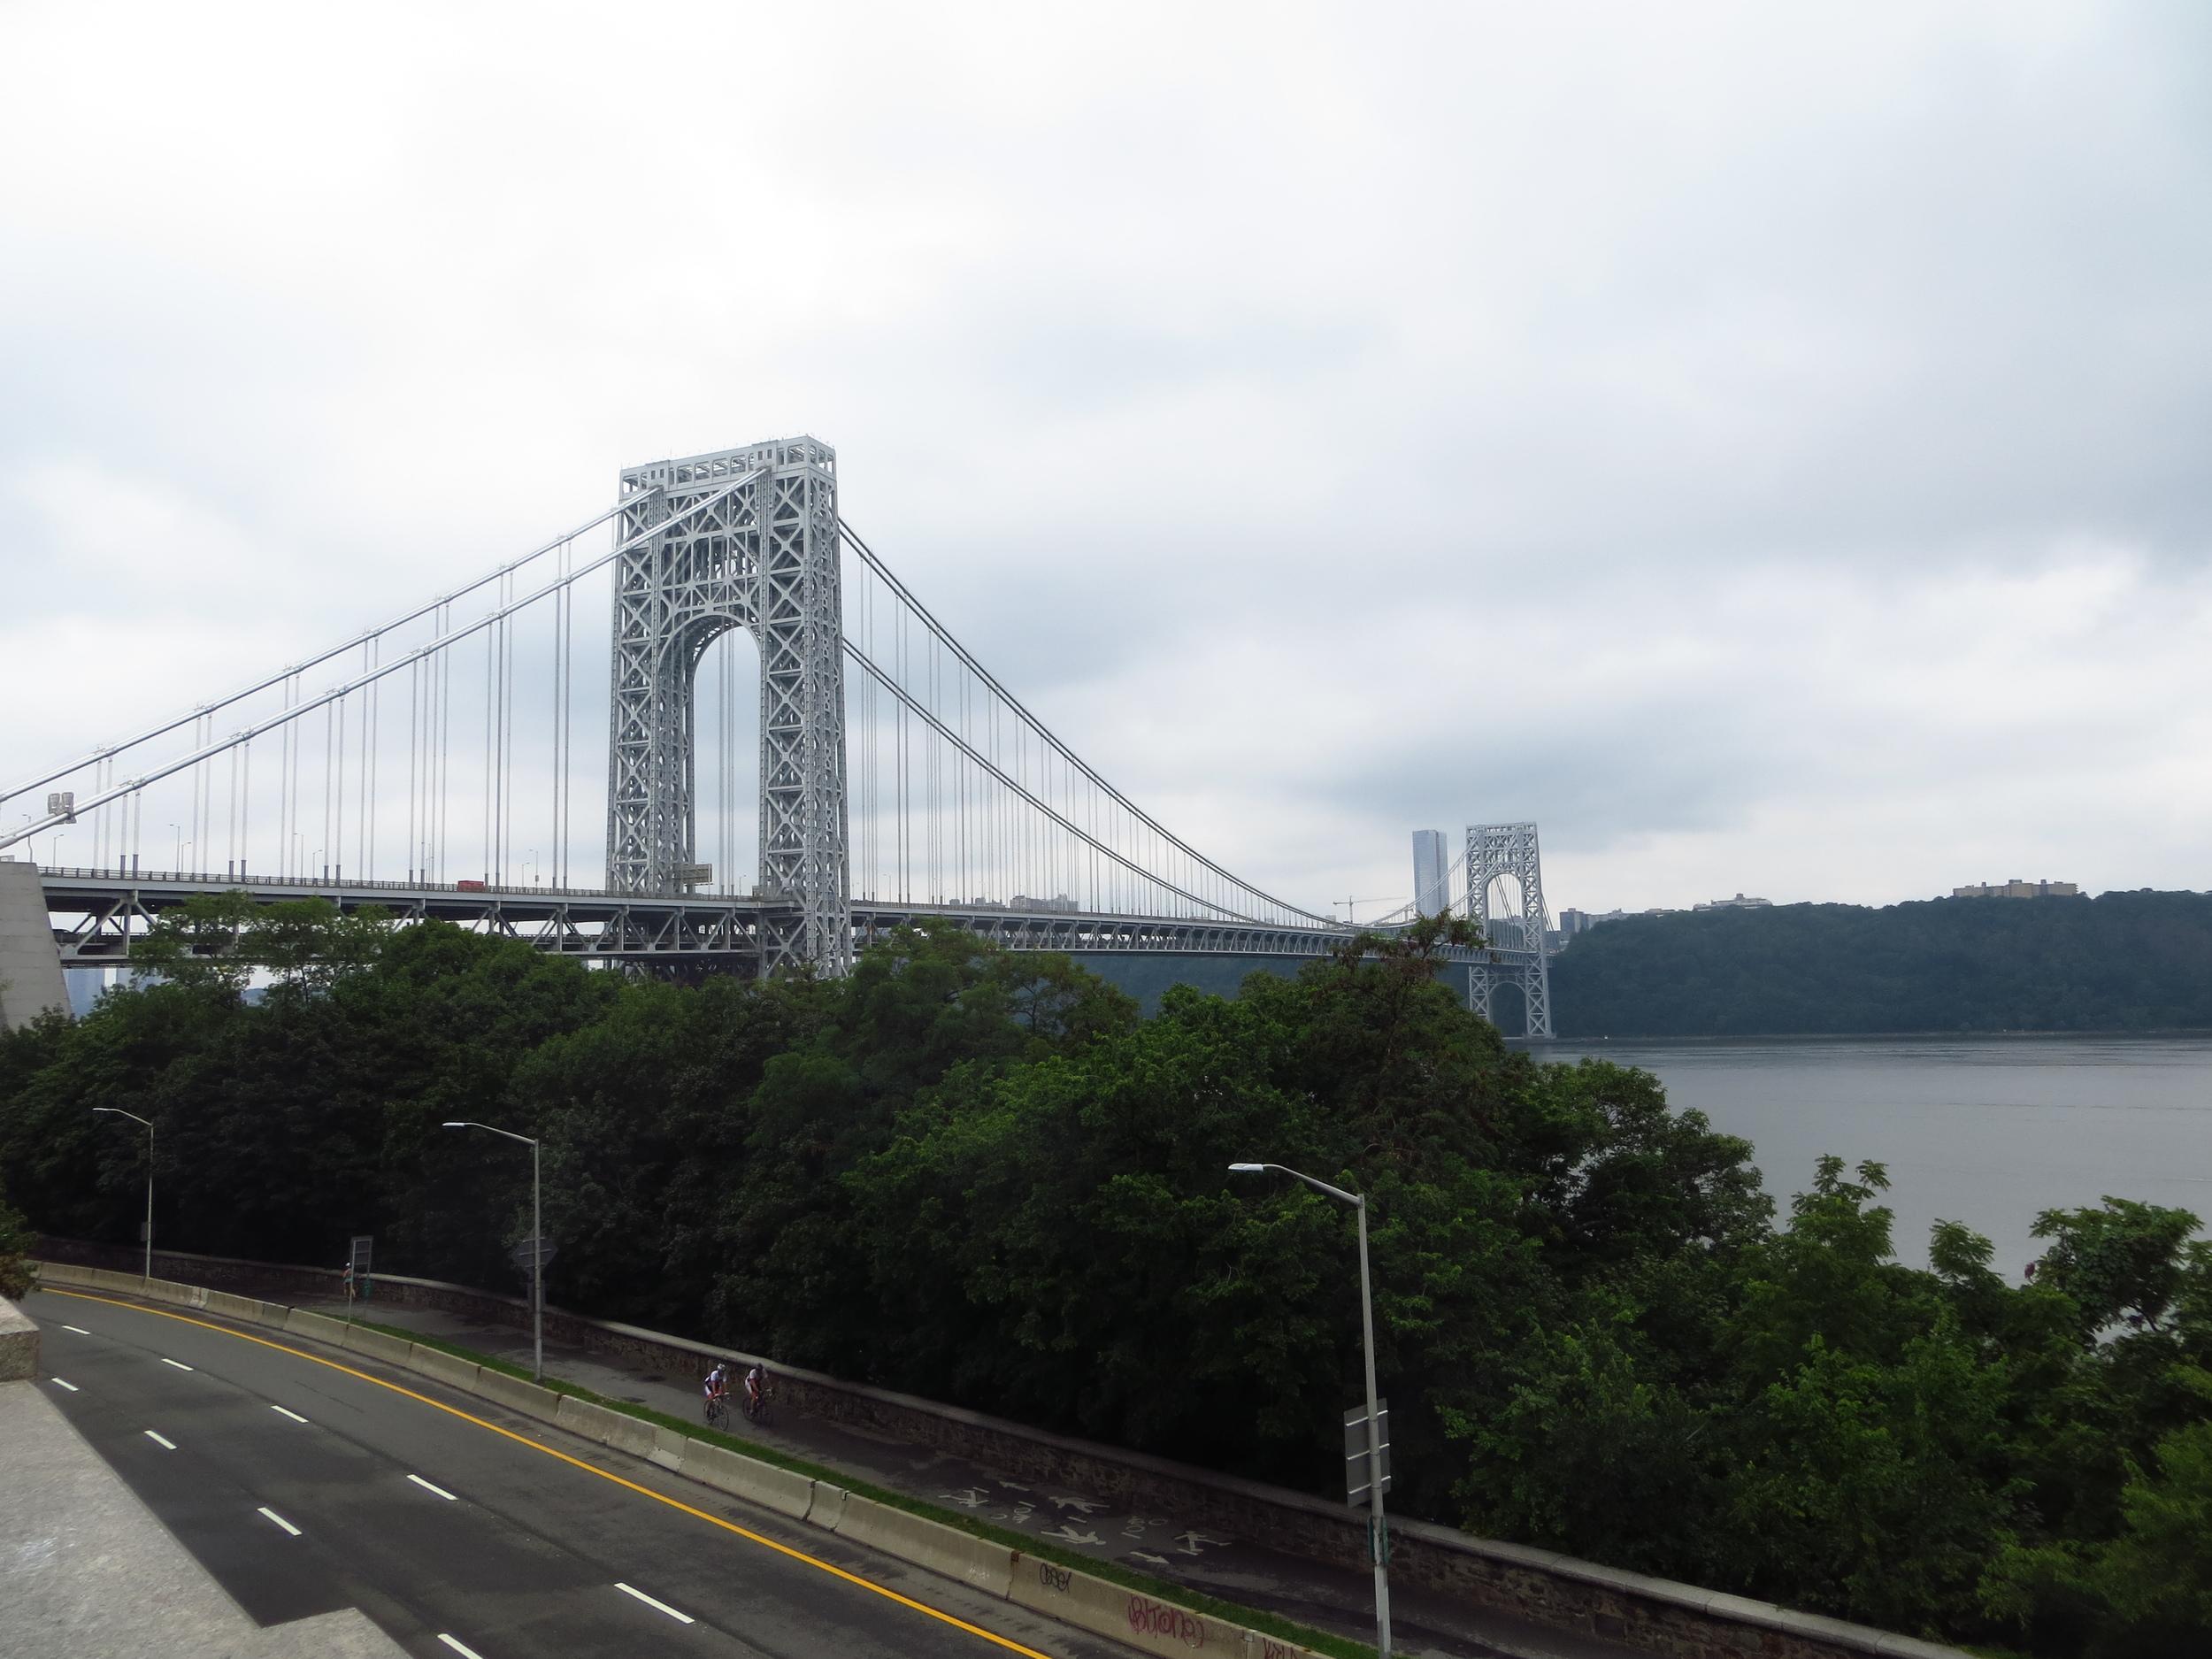 George Washington Bridge again